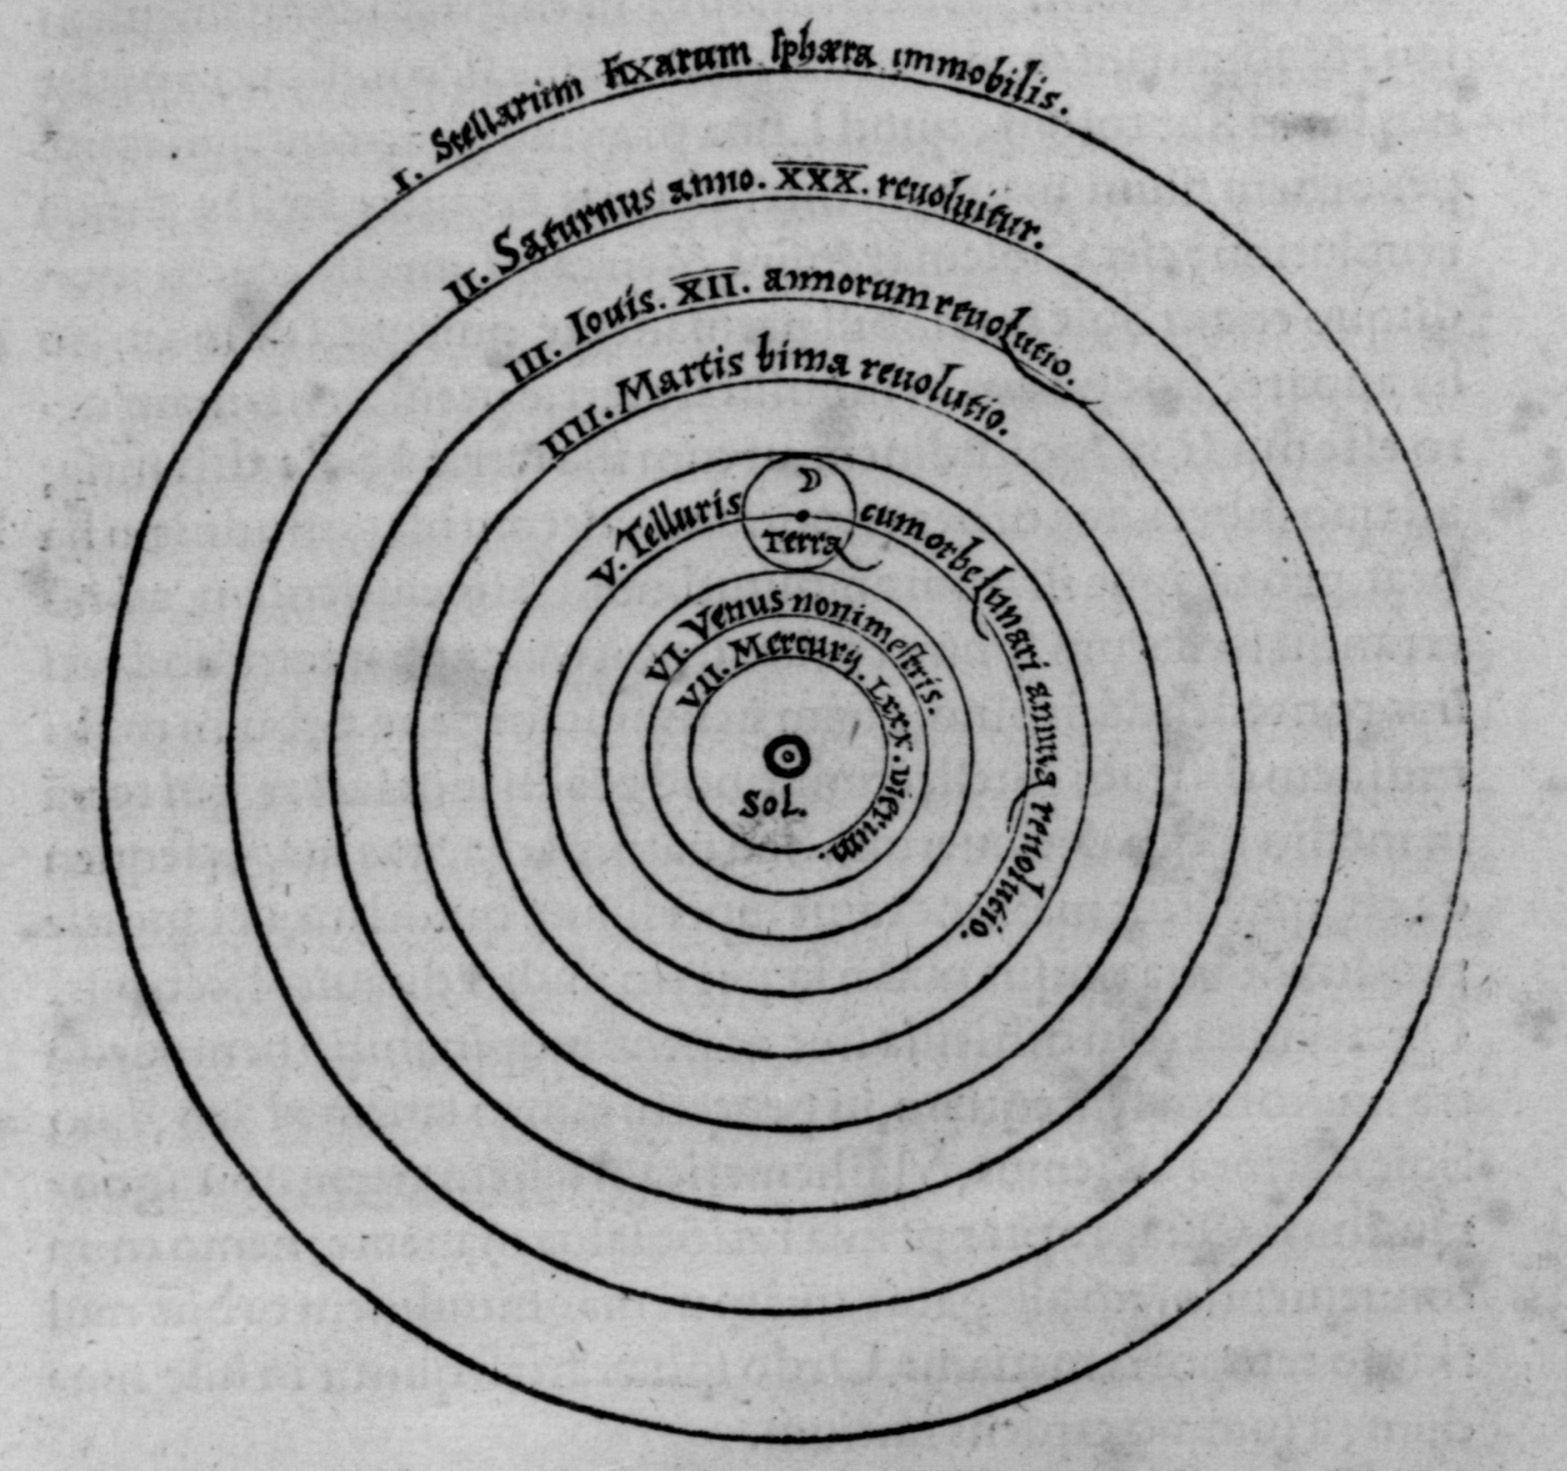 Copernicus model of the solarsystem 1543 | Science | Pinterest